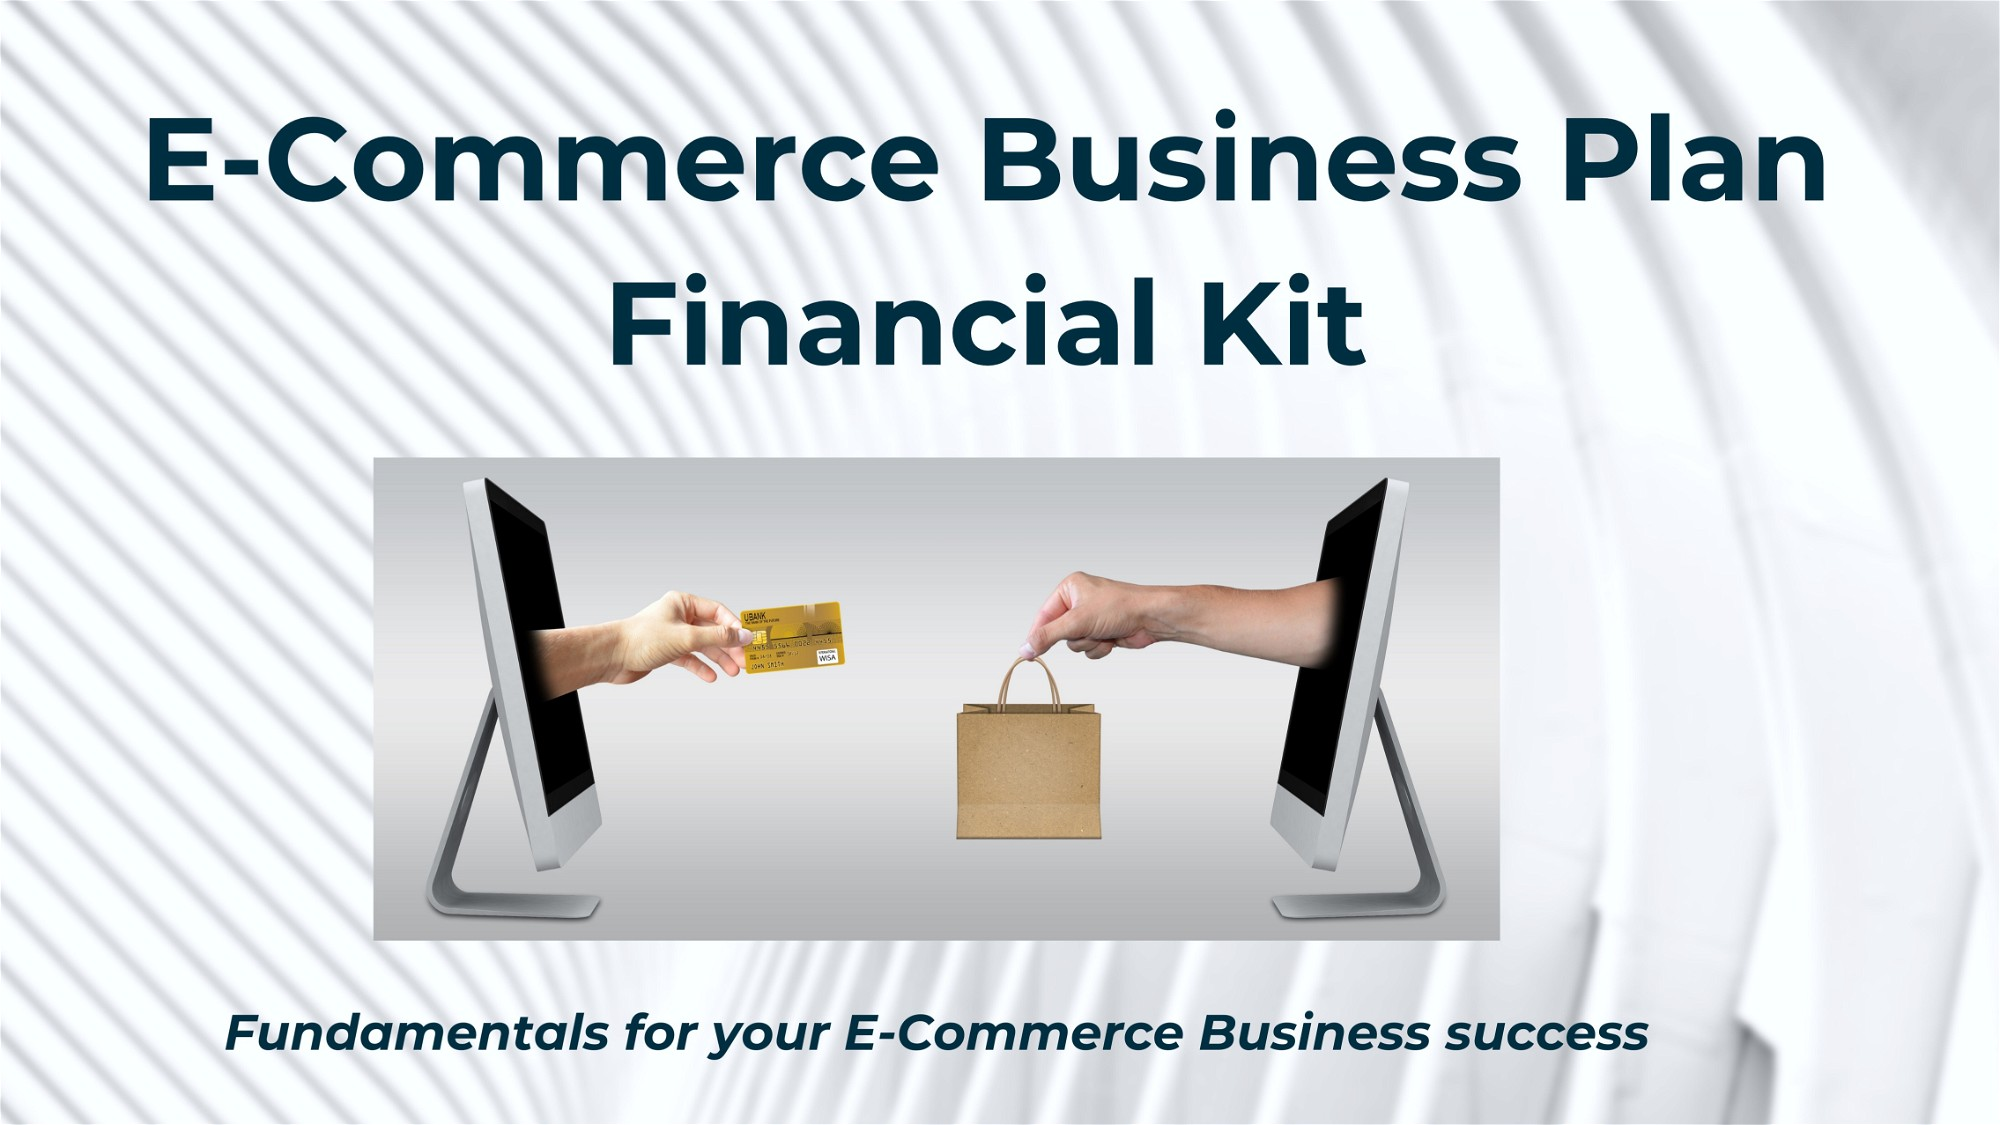 AppSumo Deal for E-Commerce Business Plan Financial Kit